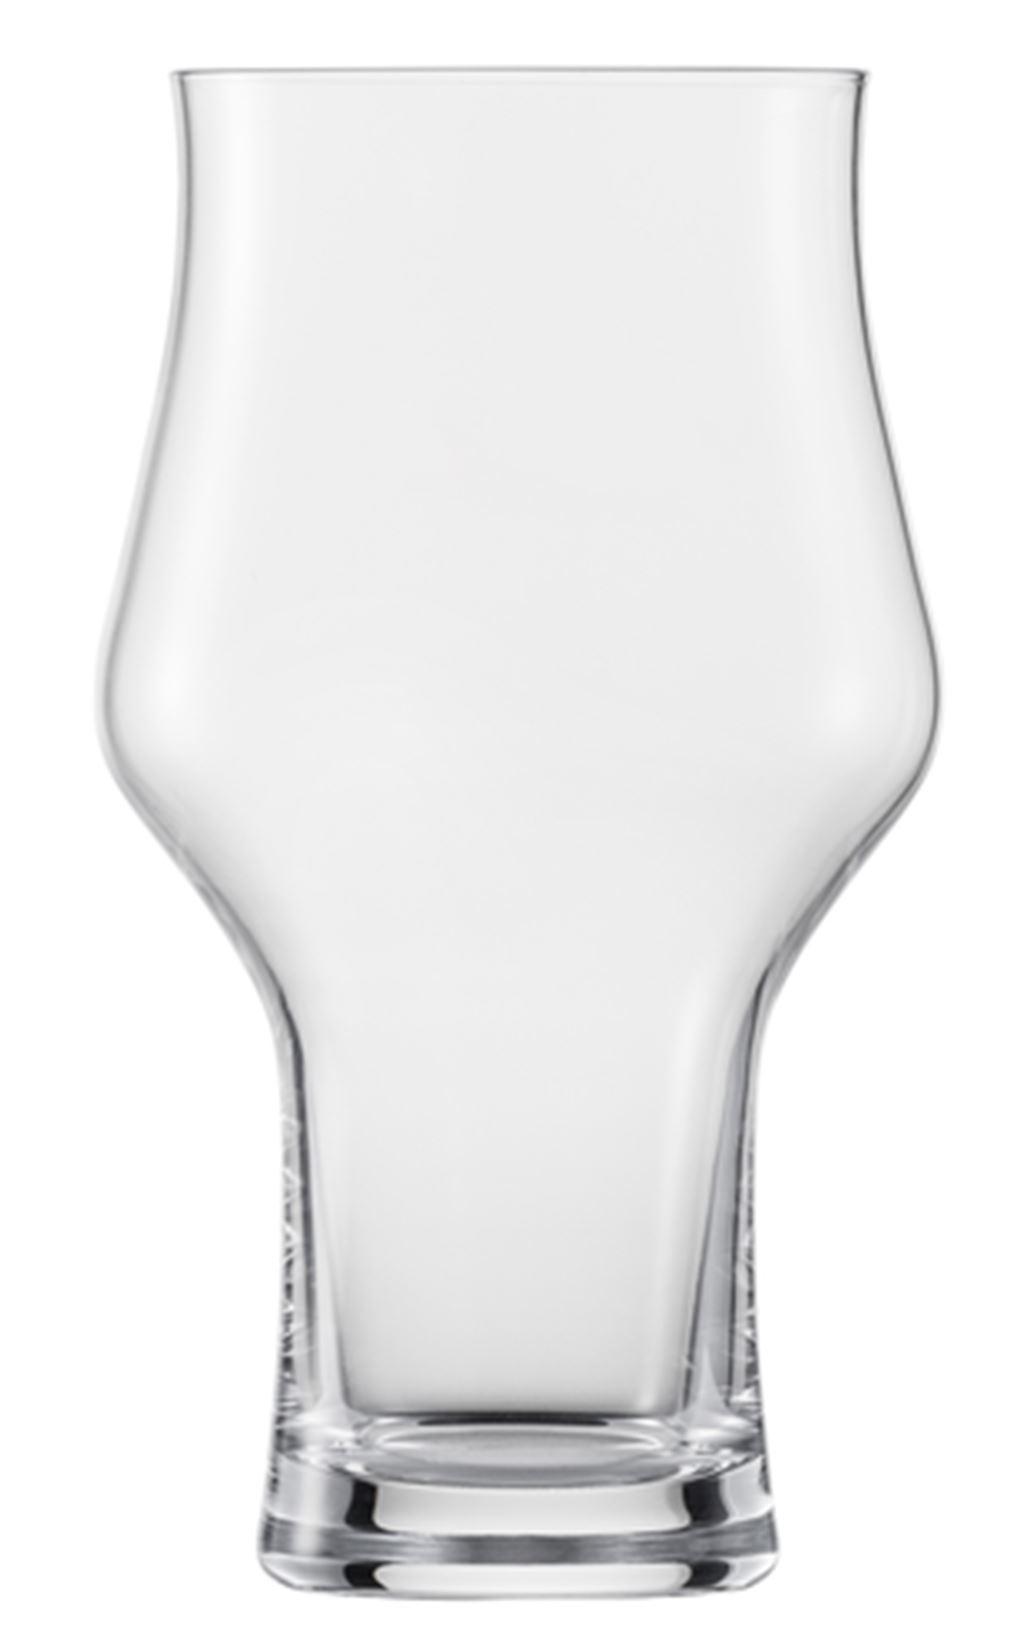 Beer basic craft kozarec stout 0,48 l